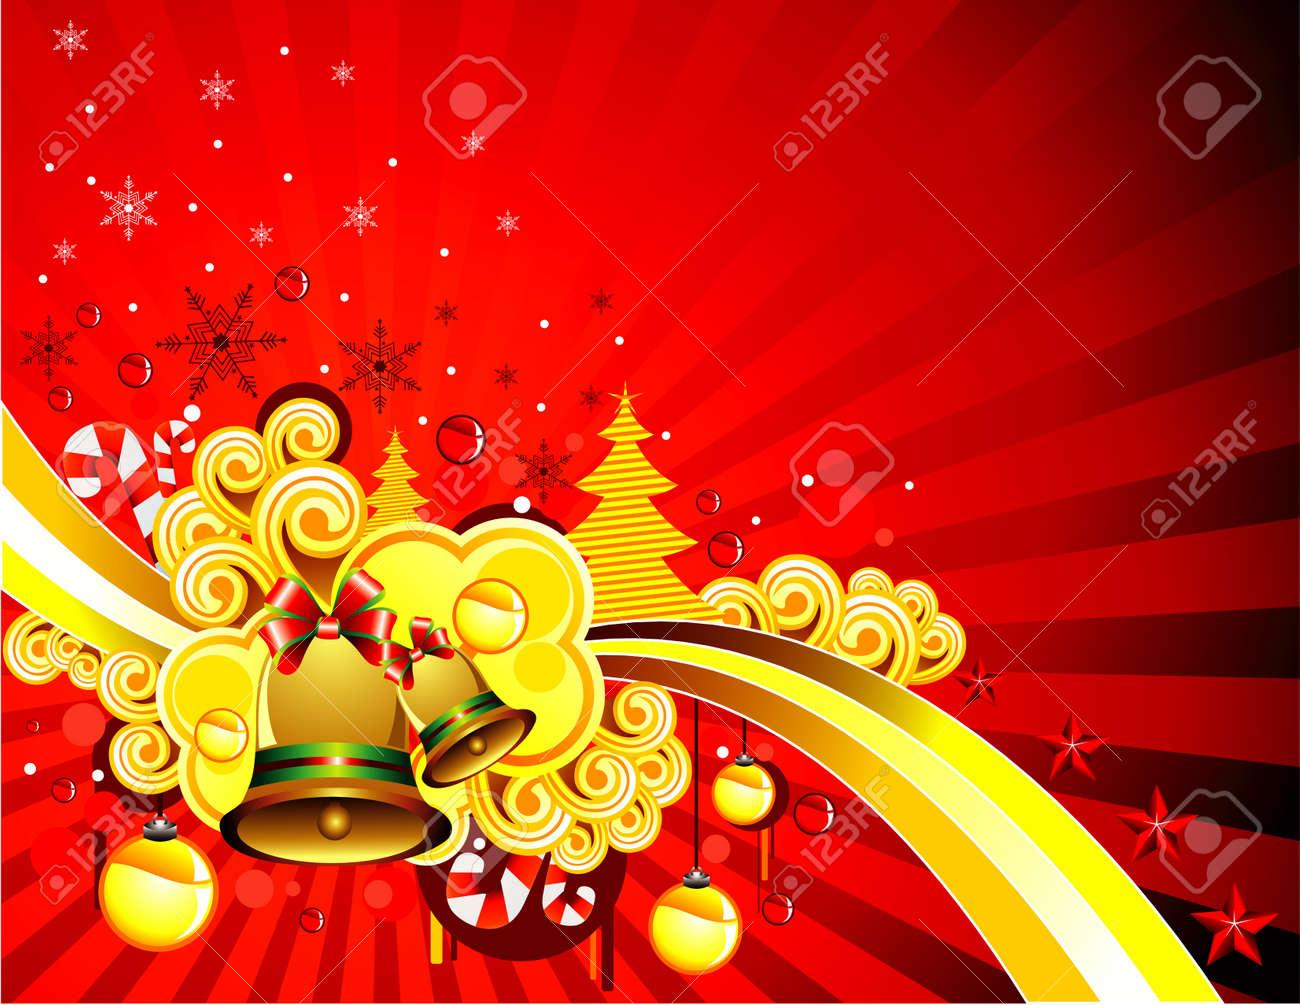 Vector illustration of fantasy shapes for christmas celebration Stock Vector - 3796251